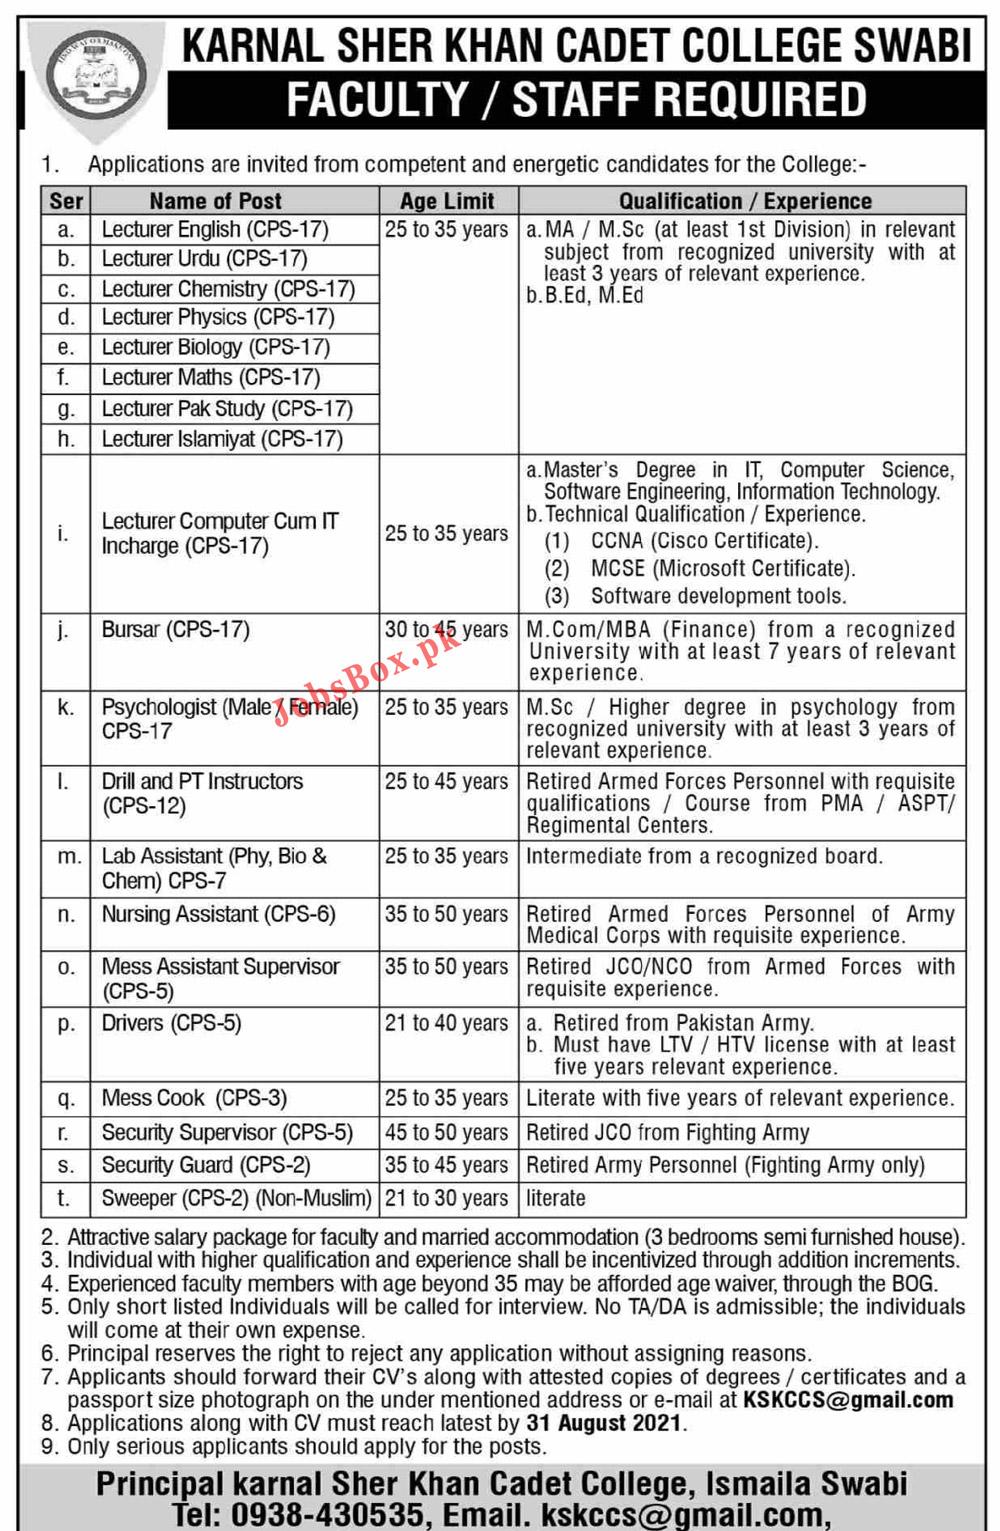 KSKCCS@gmail.com - Karnal Sher Khan Cadet College Swabi Jobs 2021 in Pakistan